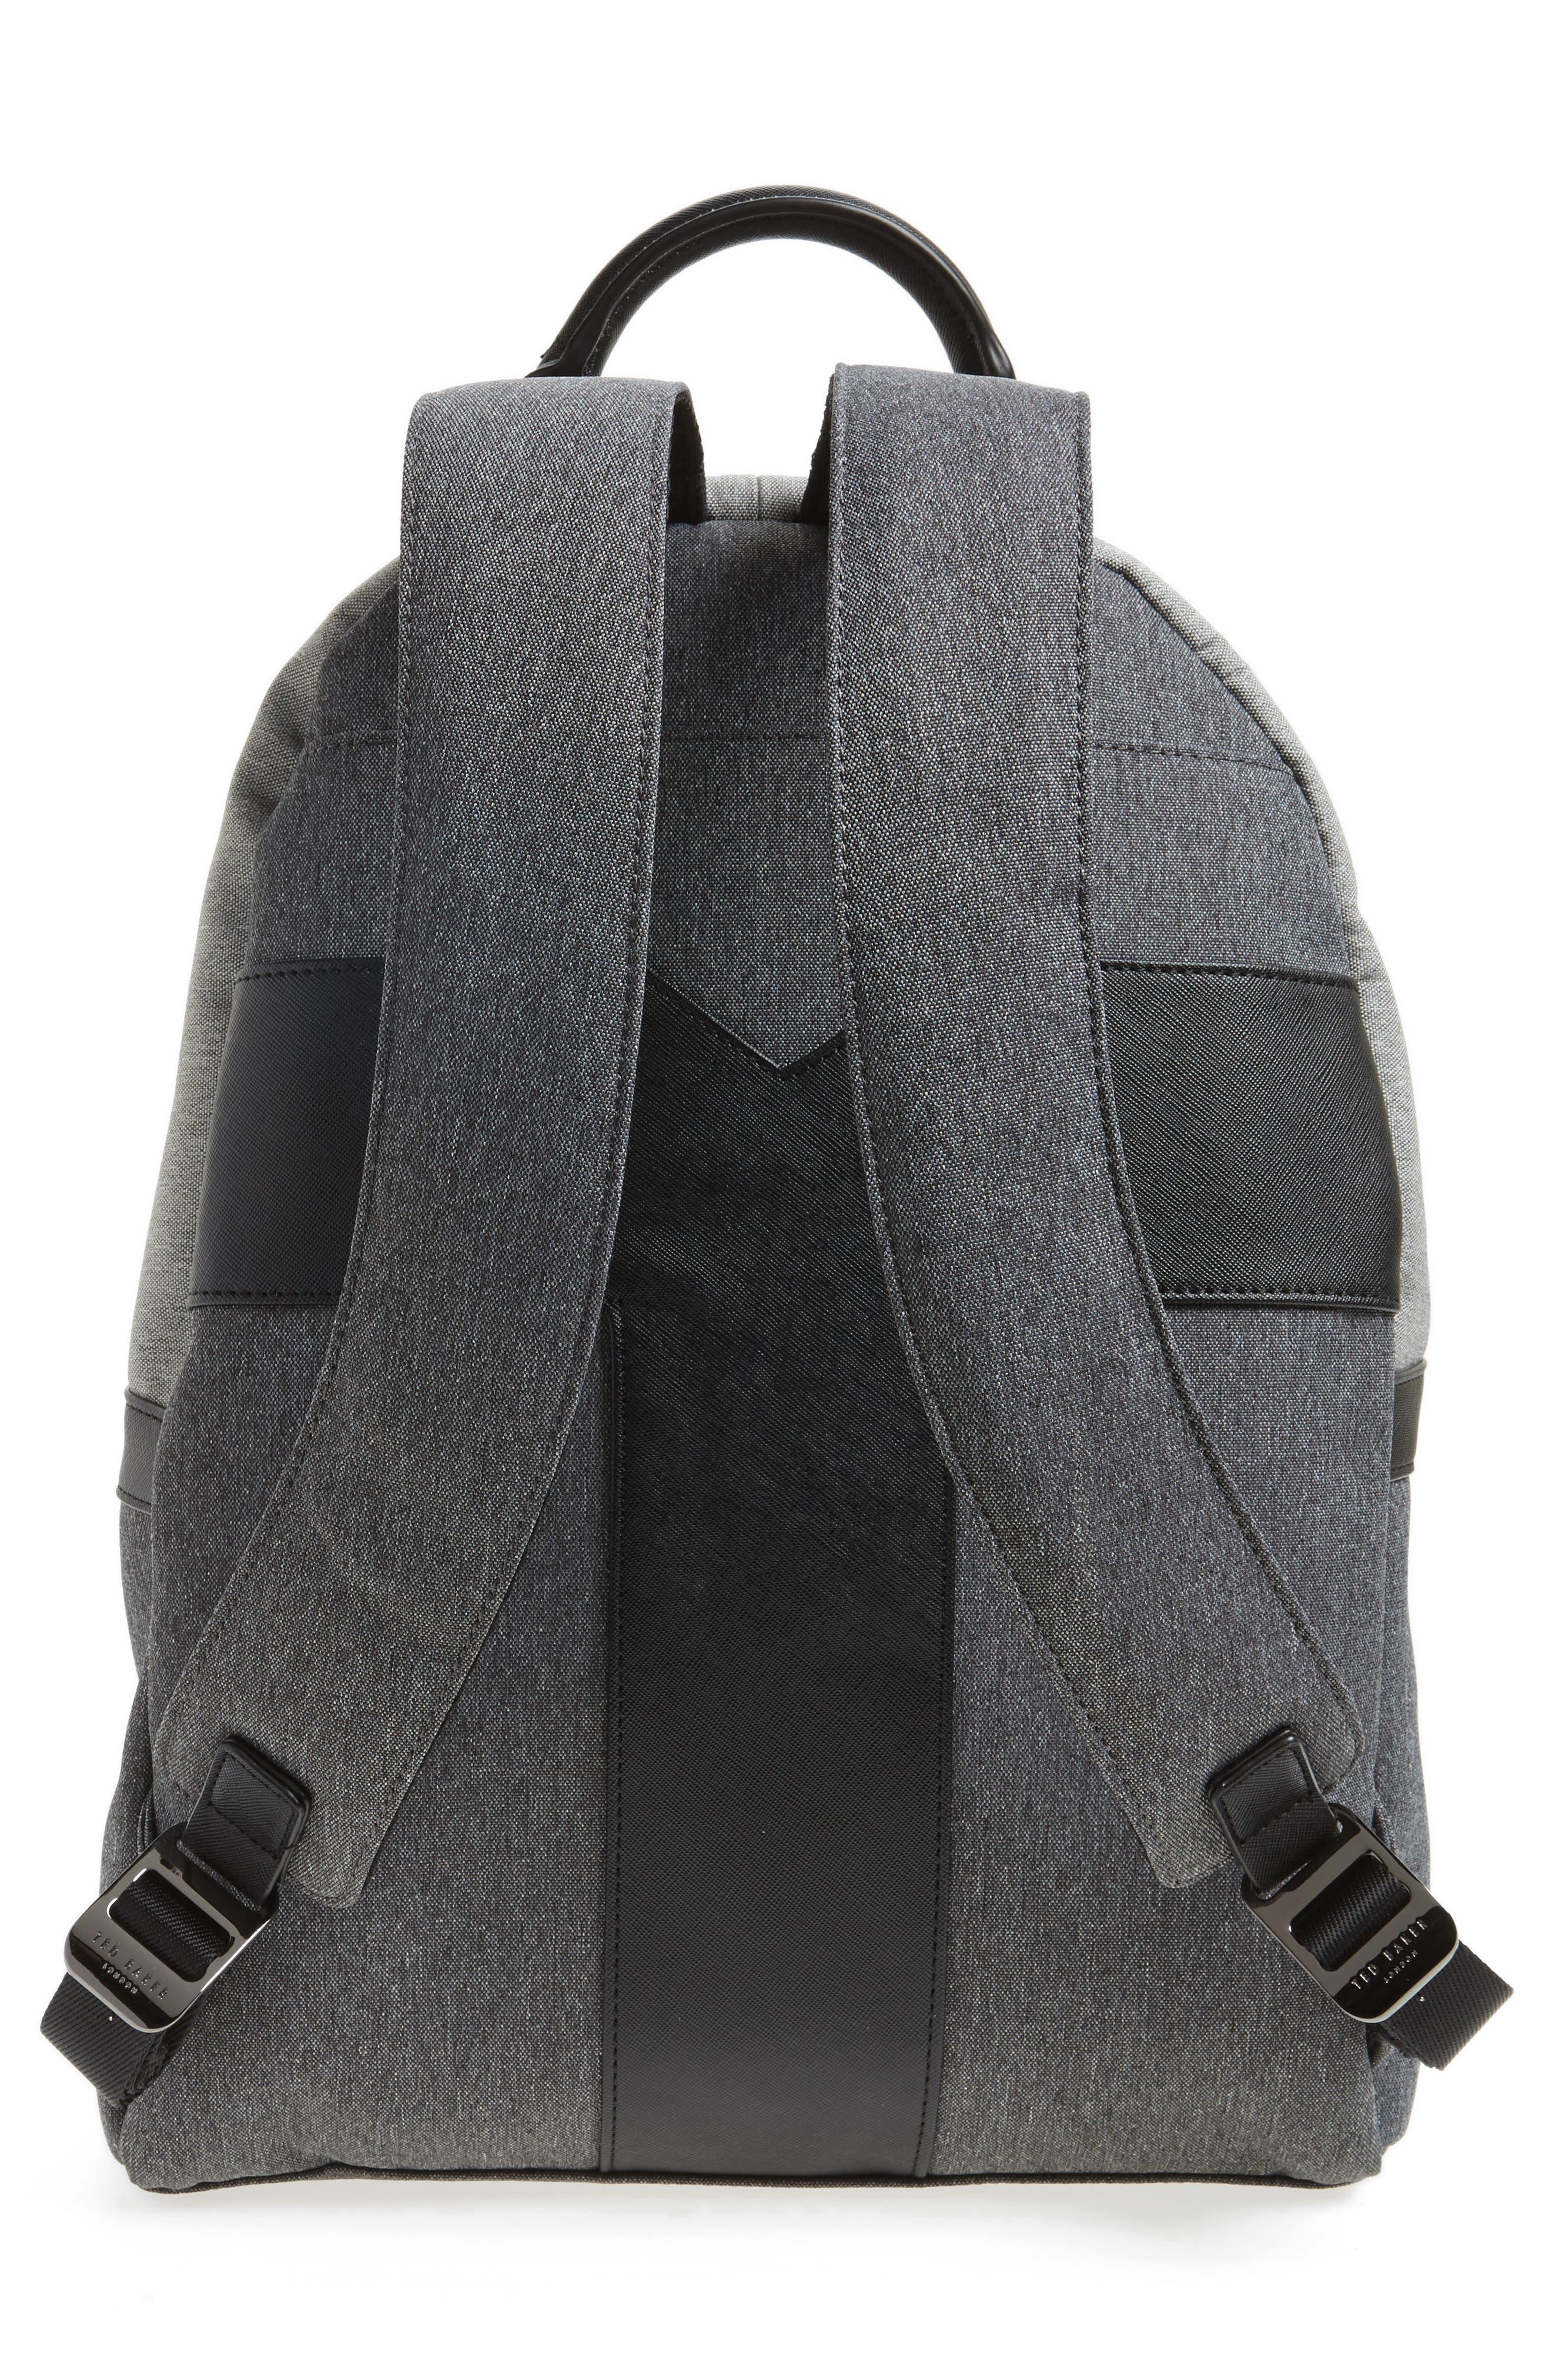 Zirabi Backpack,                             Alternate thumbnail 5, color,